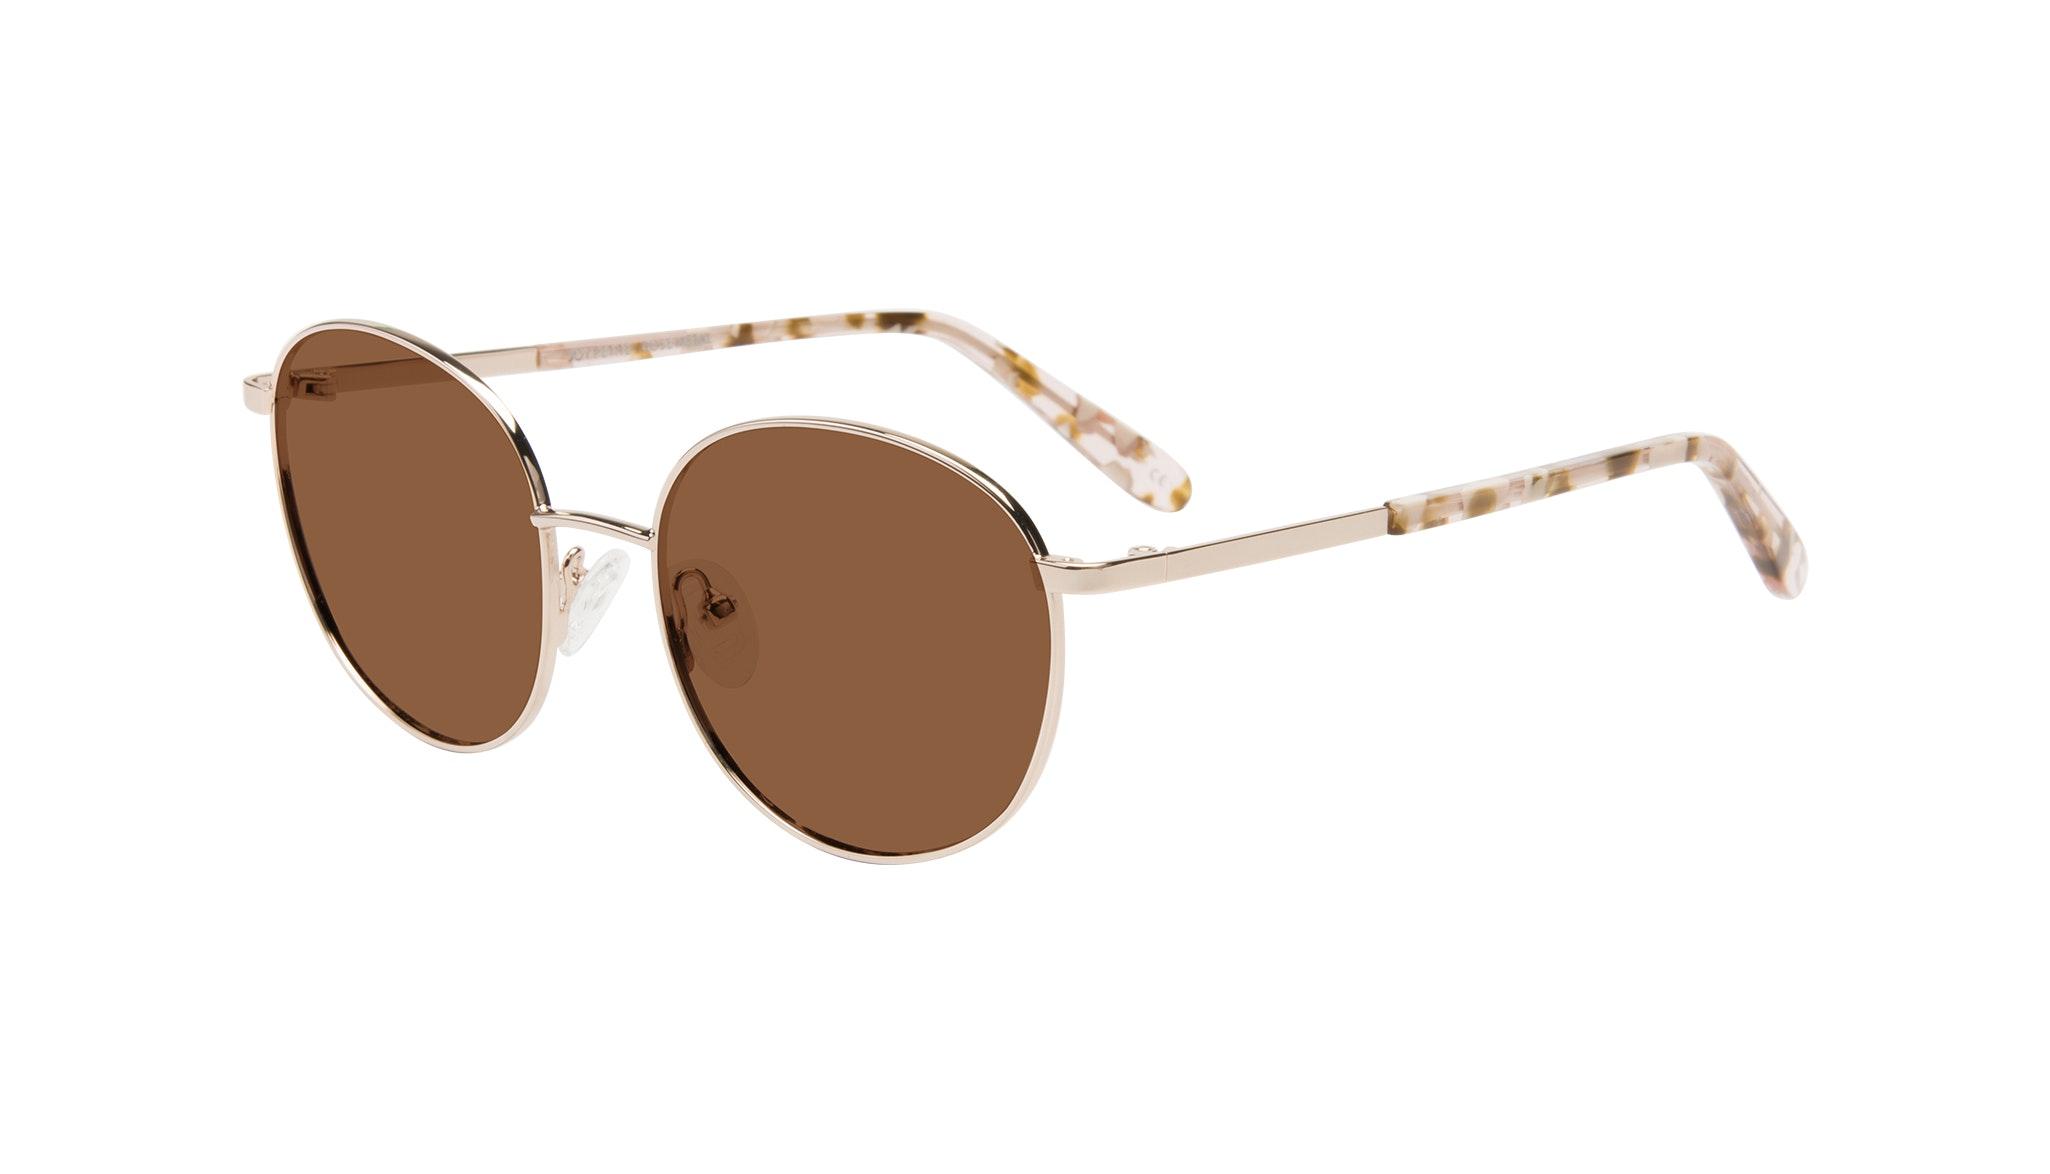 Affordable Fashion Glasses Round Sunglasses Women Joy Petite Rose Metal Tilt